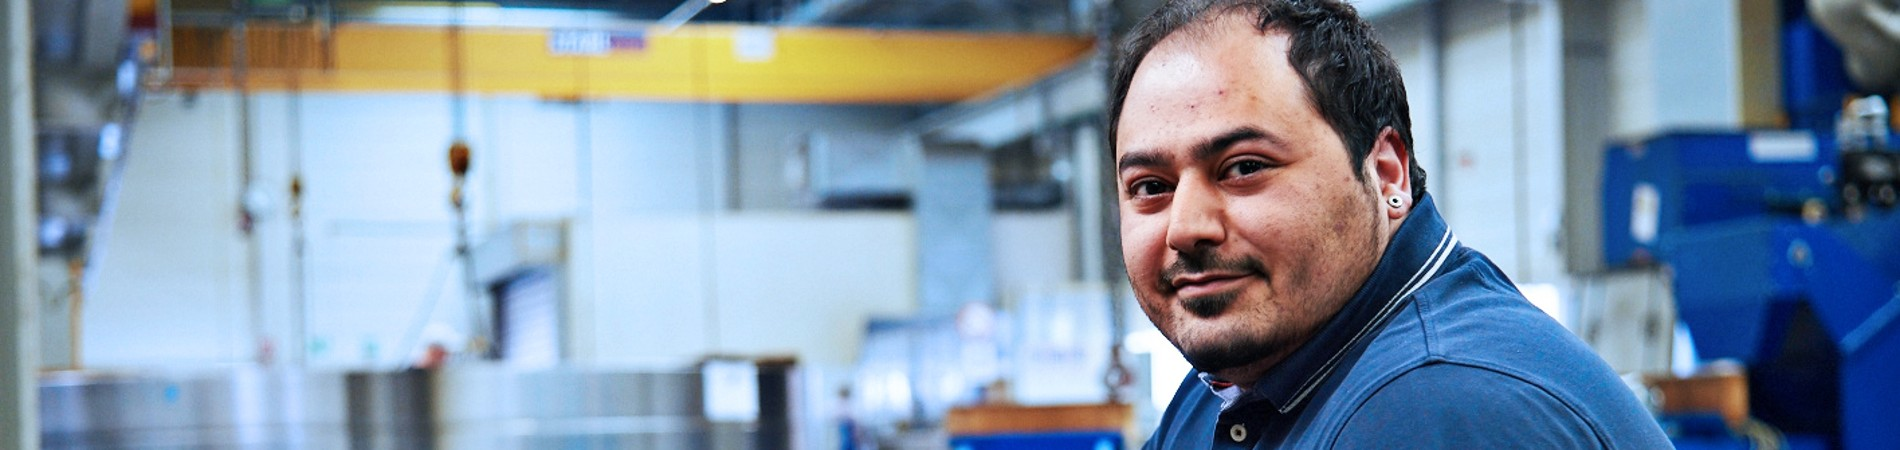 thyssenkrupp Bearings employee experience report Ümet Dogan